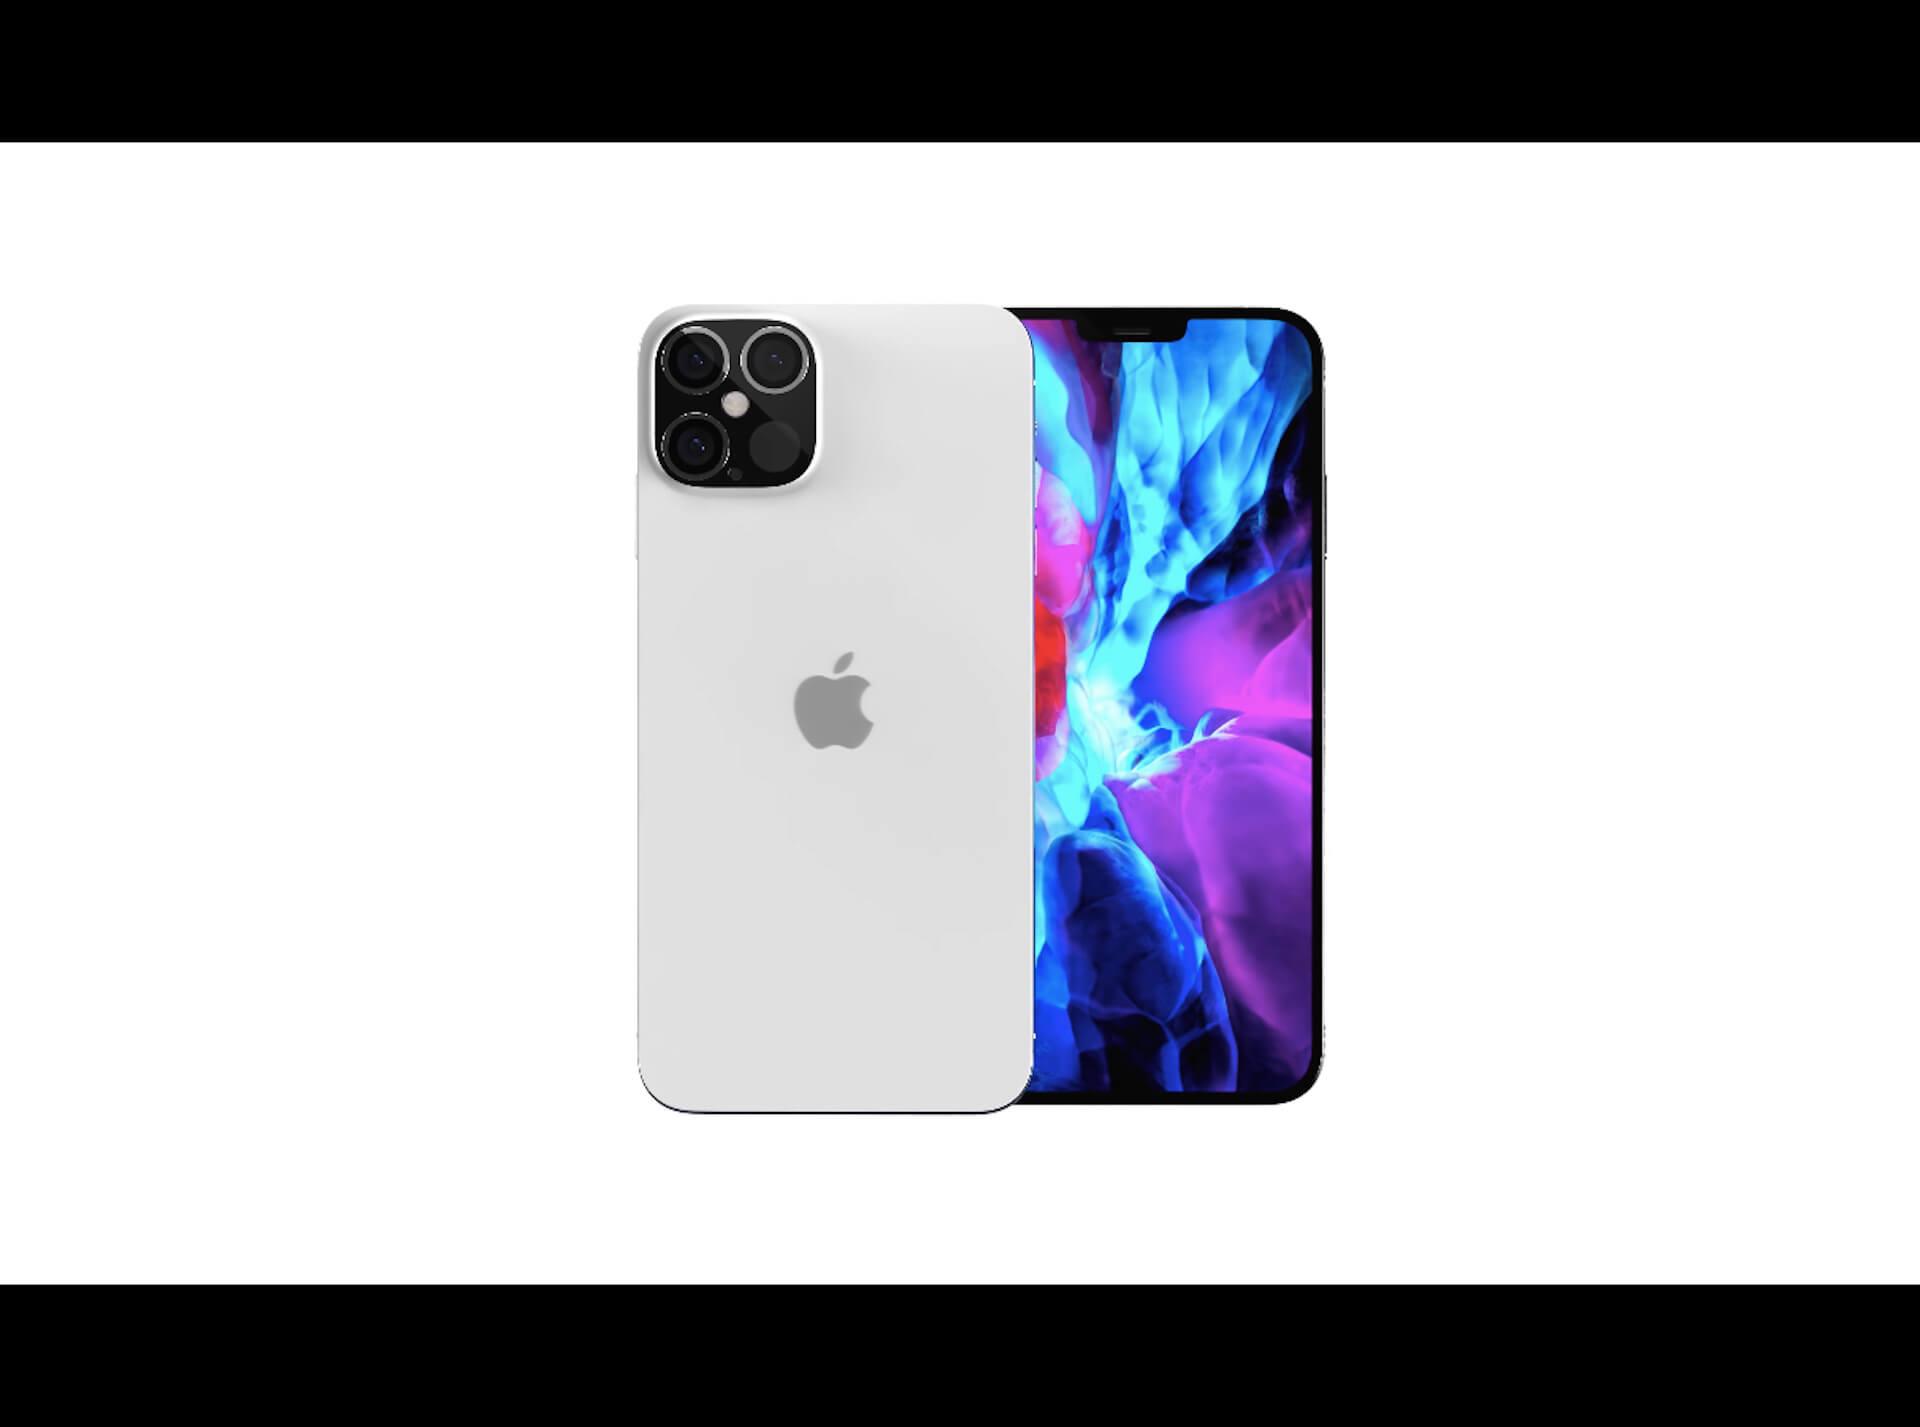 iPhone 12、やはり1〜2ヶ月の発表遅れか|A14チップの製造も遅れ tech200326_iphone12_main